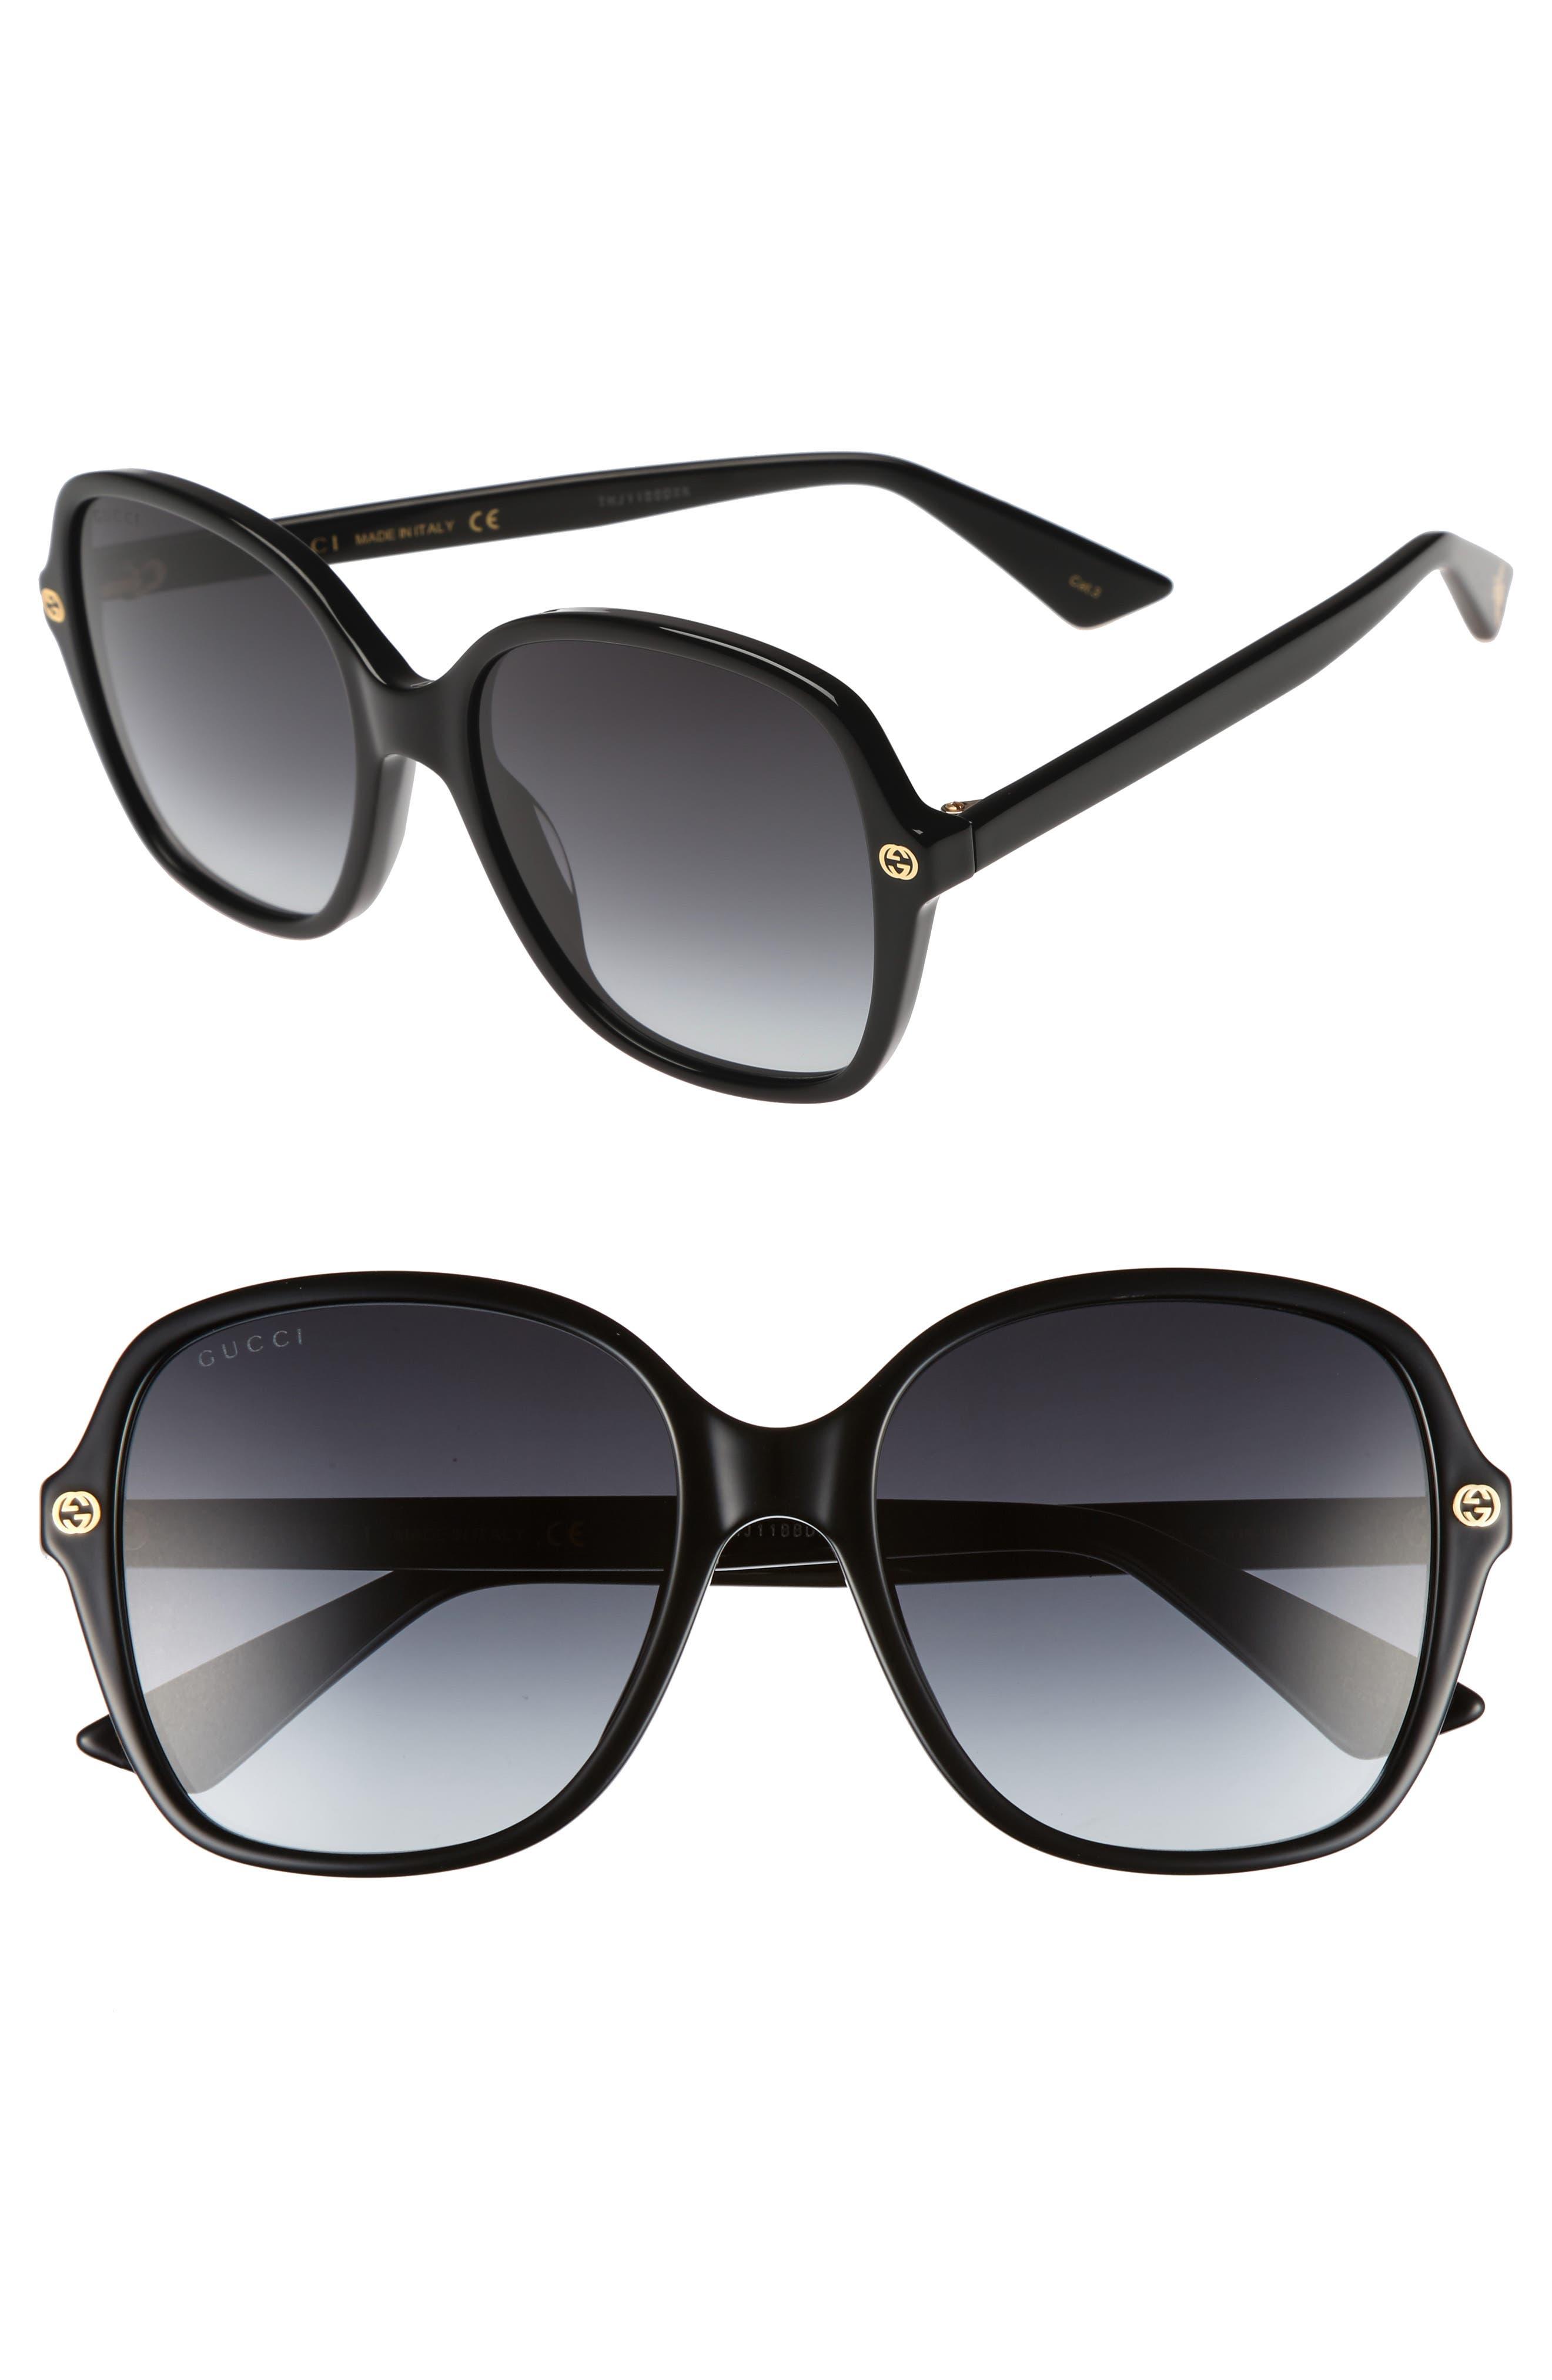 Main Image - Gucci 55mm Gradient Sunglasses